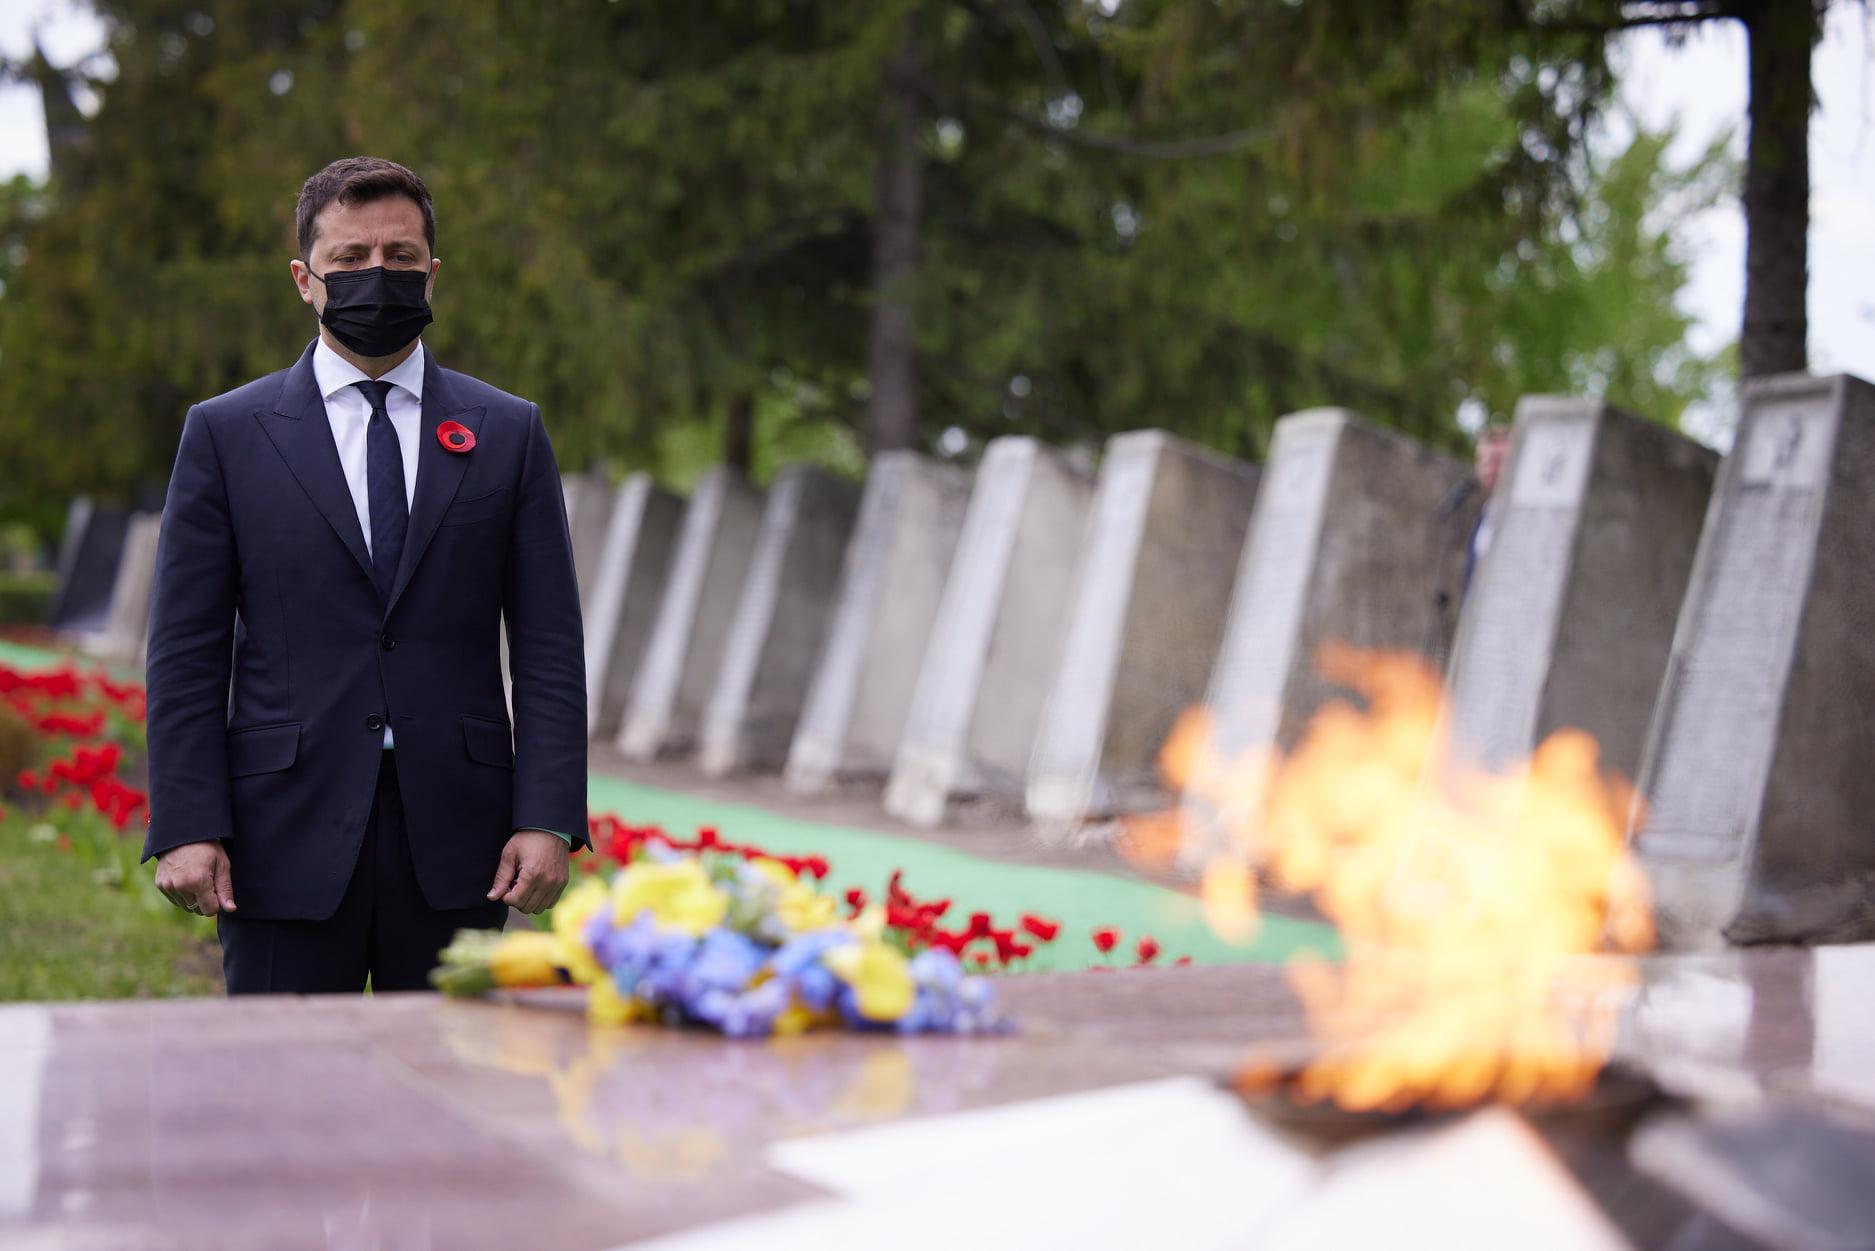 Владимир Зеленский. Фото © Сайт президента Украины